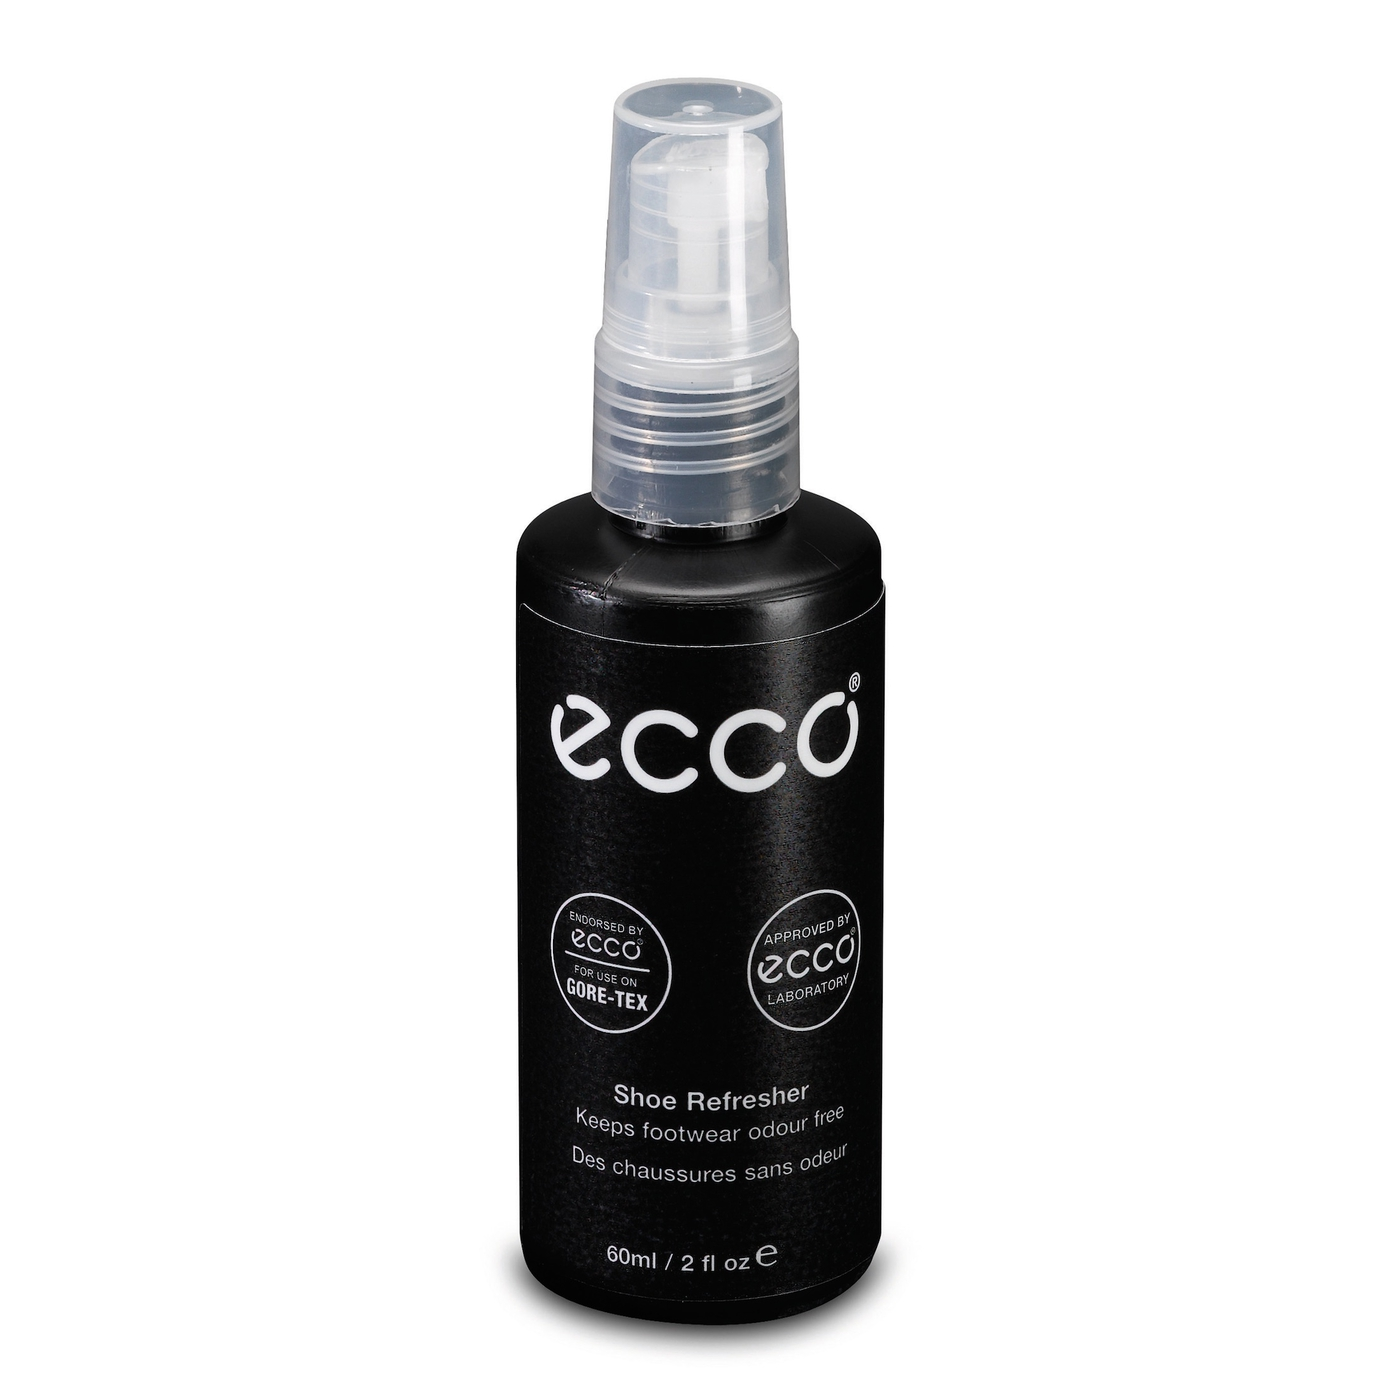 ECCO Shoe Refresher Spray